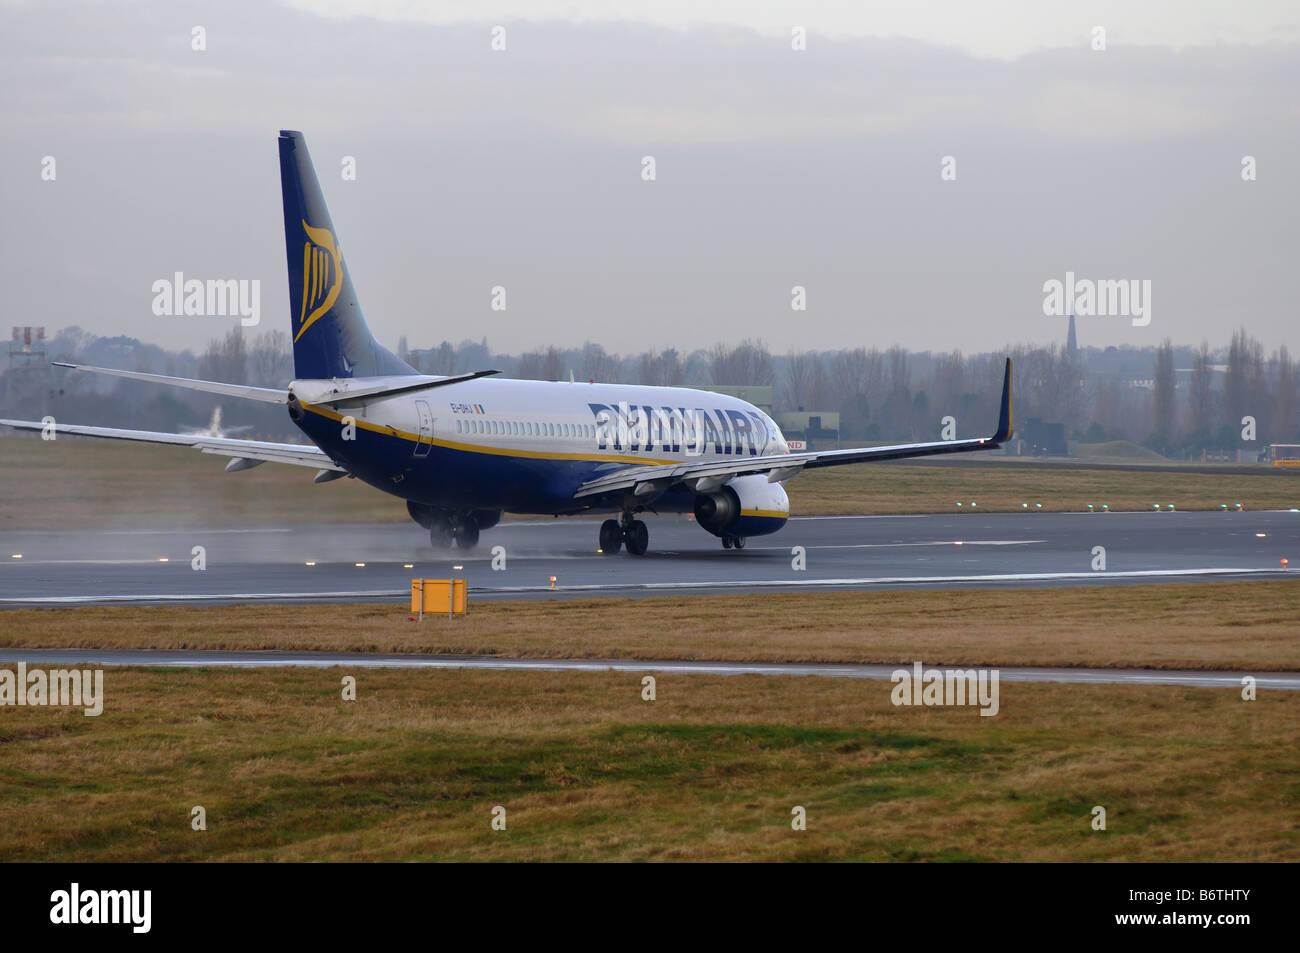 Ryanair Boeing 737 aircraft taking off at Birmingham International Airport, UK Stock Photo